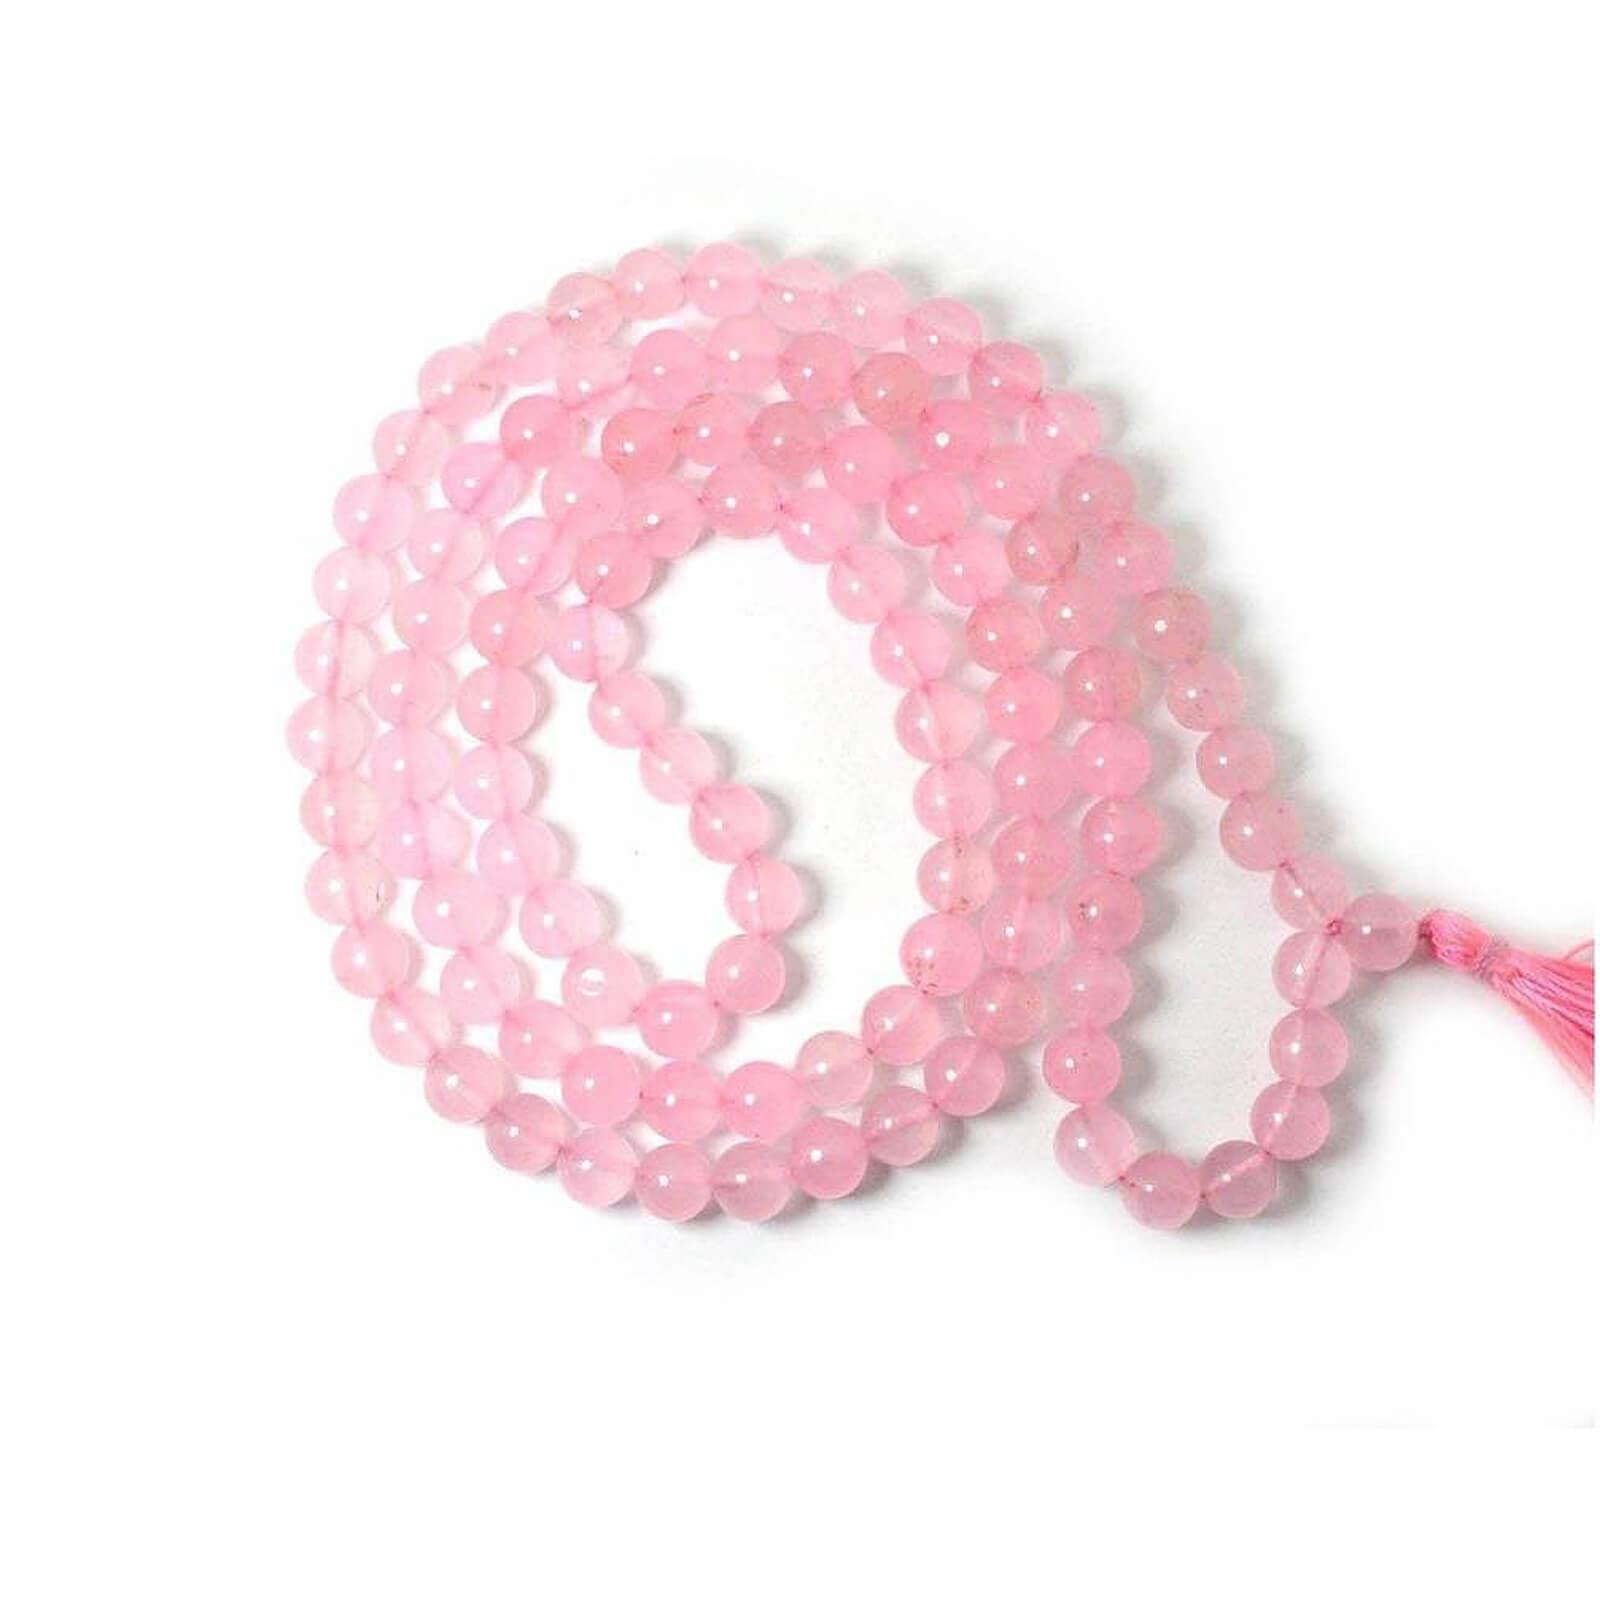 Natural Rose Quartz  Beads String Mala (24 Inch)